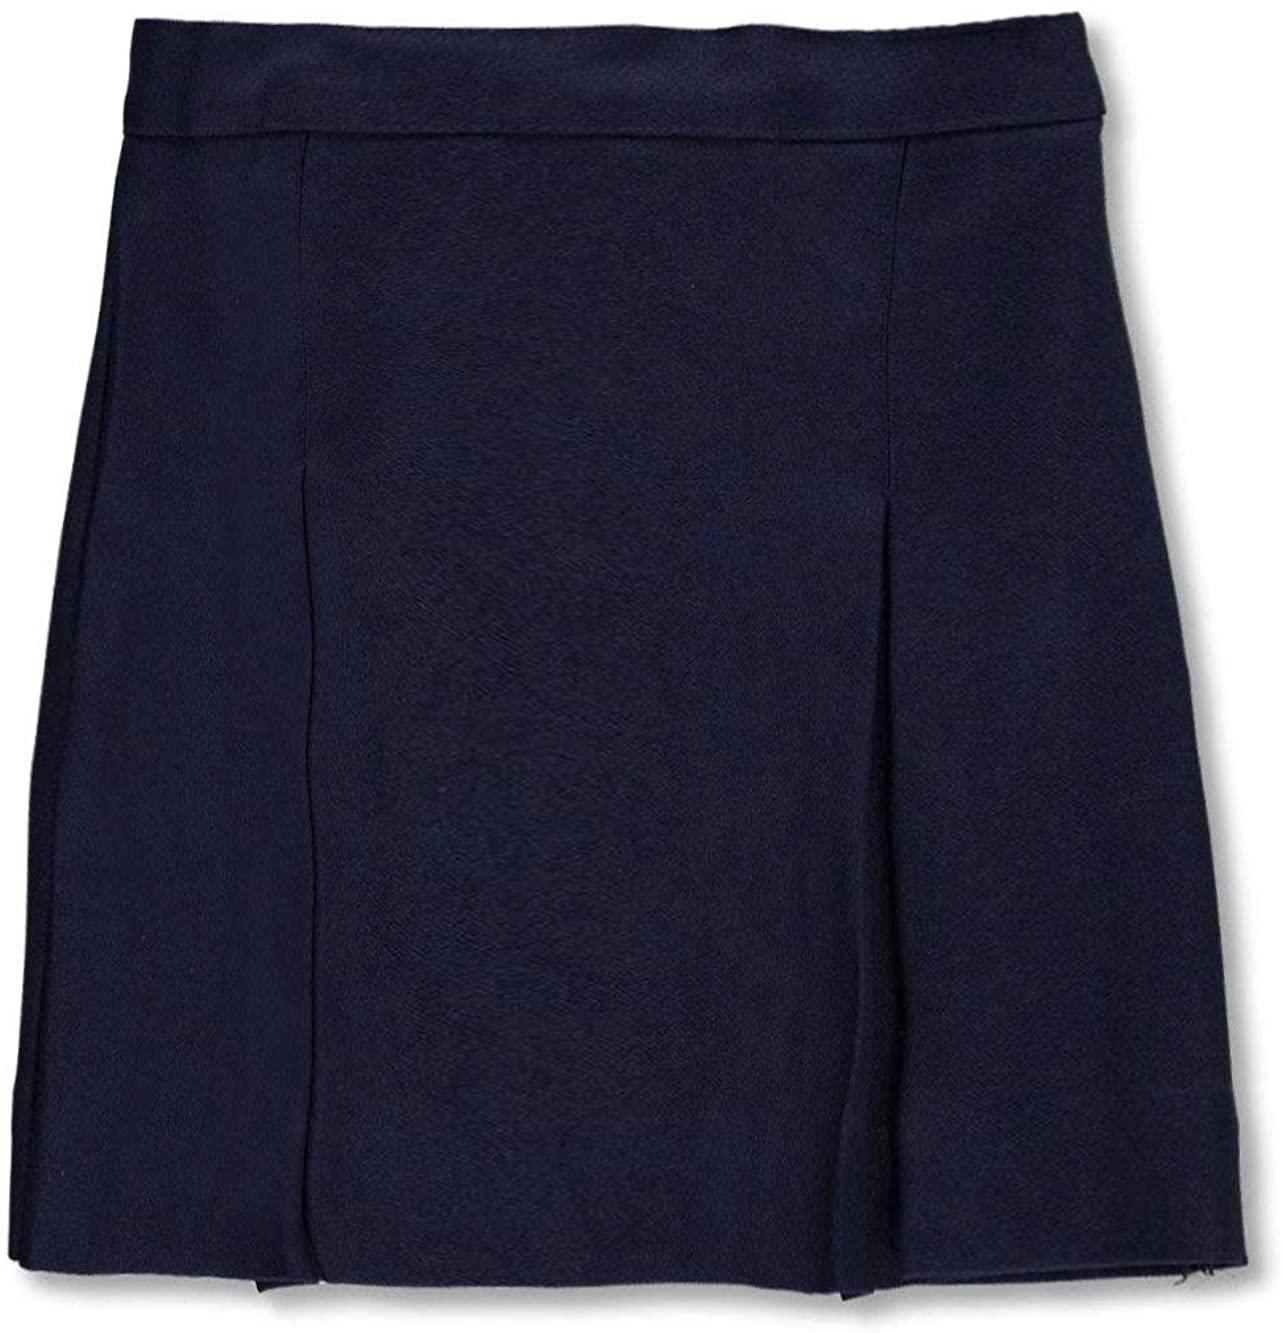 Cookie's Girls' Box Pleat Plaid Uniform Skirt